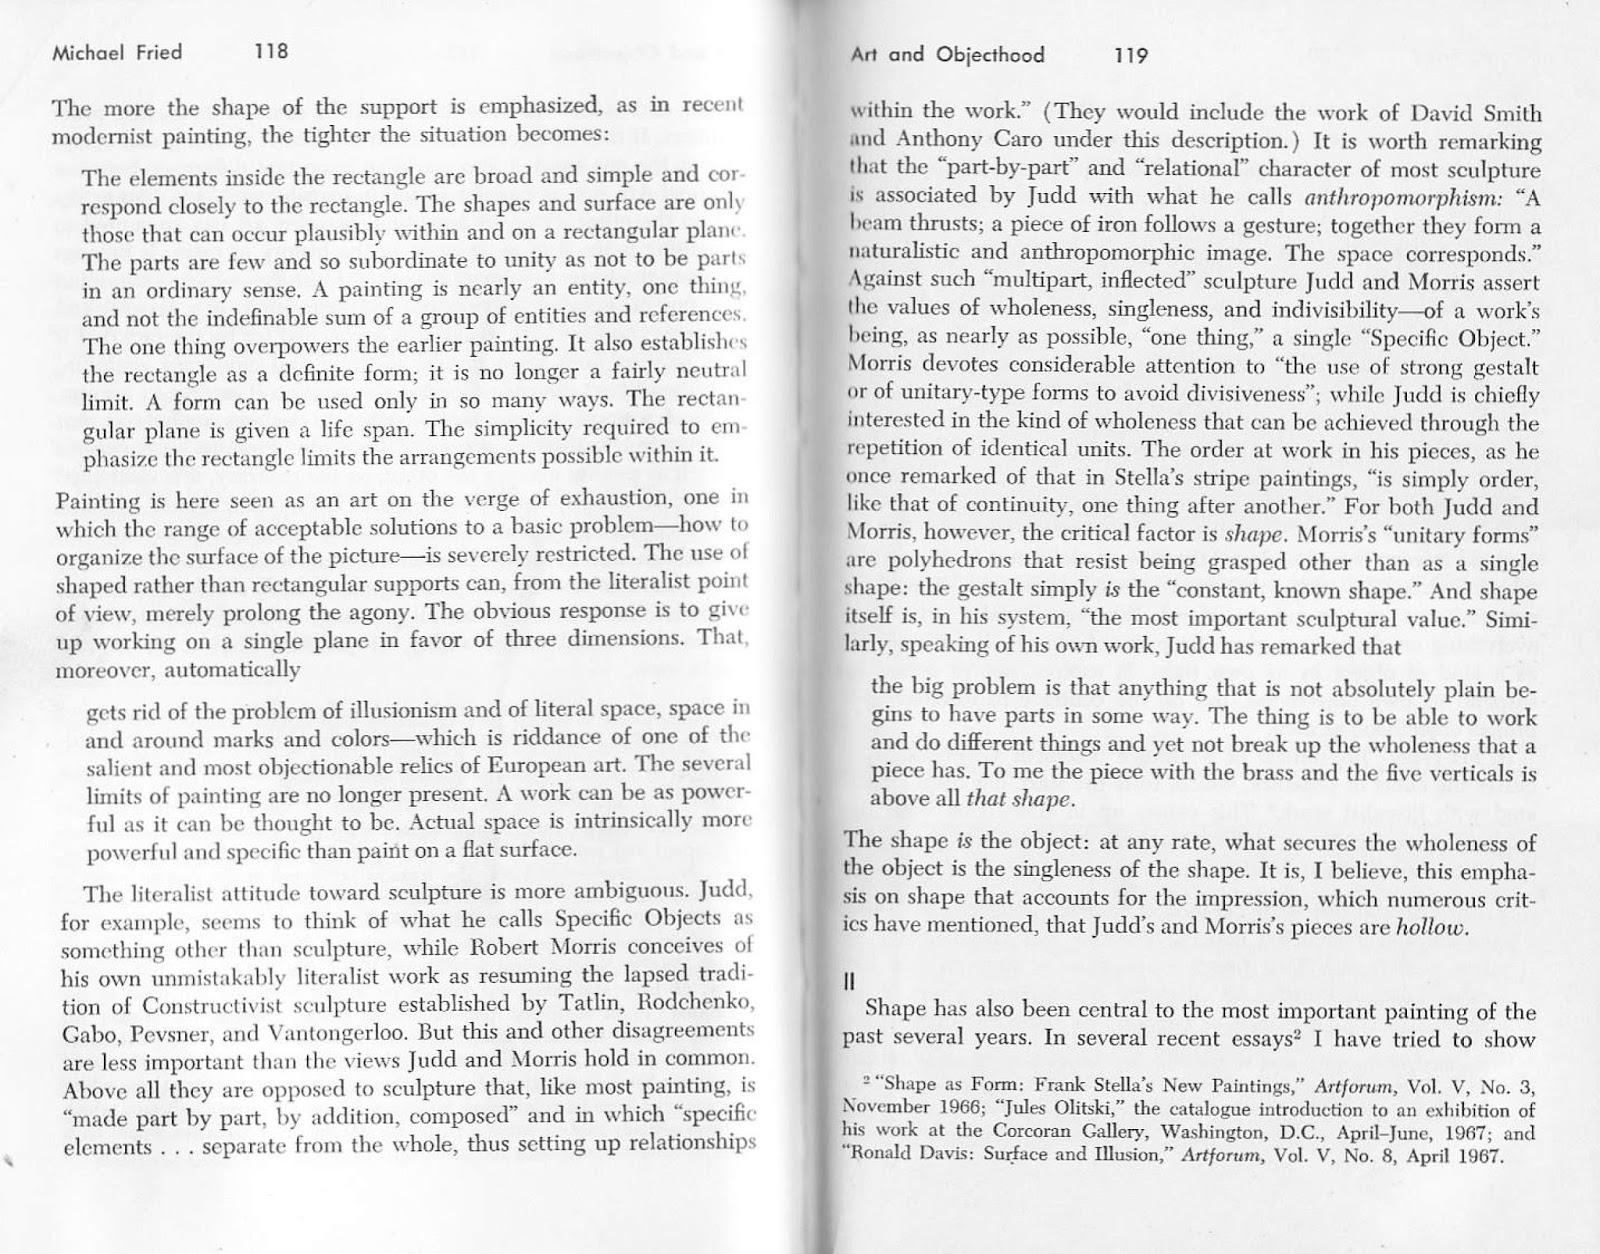 objecthood essay Objecthood' research papers - academiaedu'art and objecthood', philosophy - sage publications michael fried's art and objecthood .